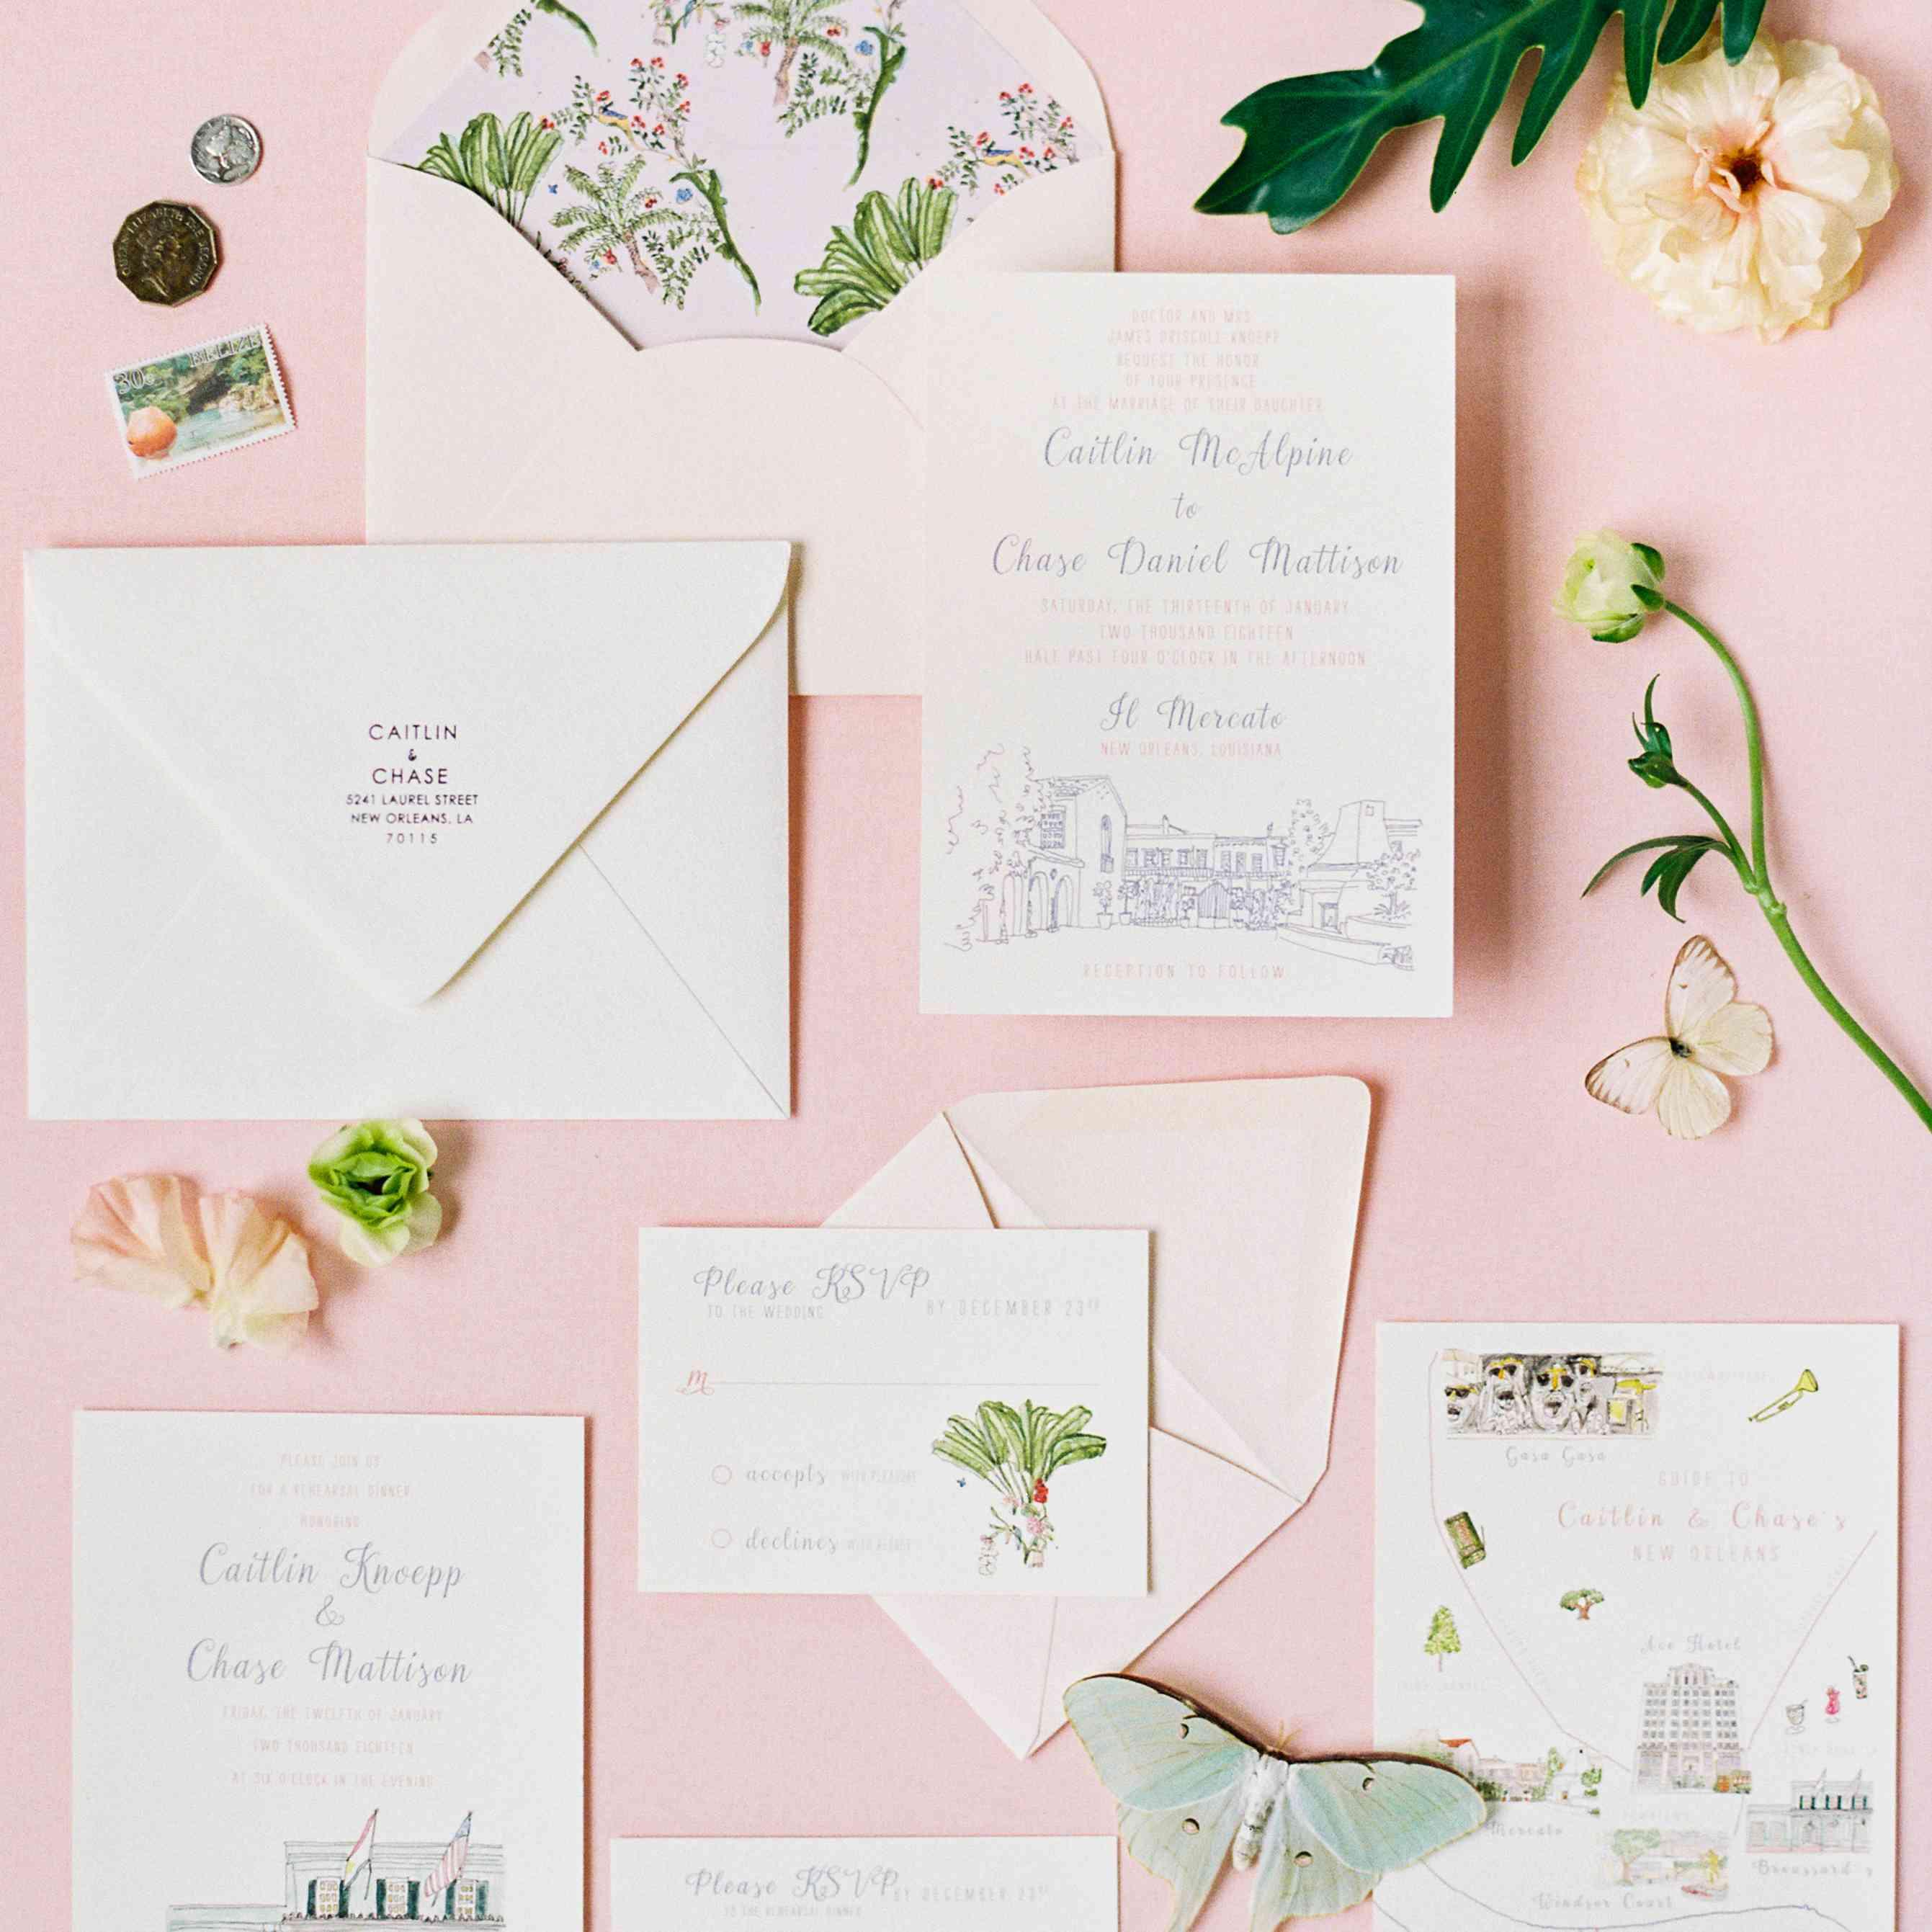 <p>wedding invitation suite</p><br><br>